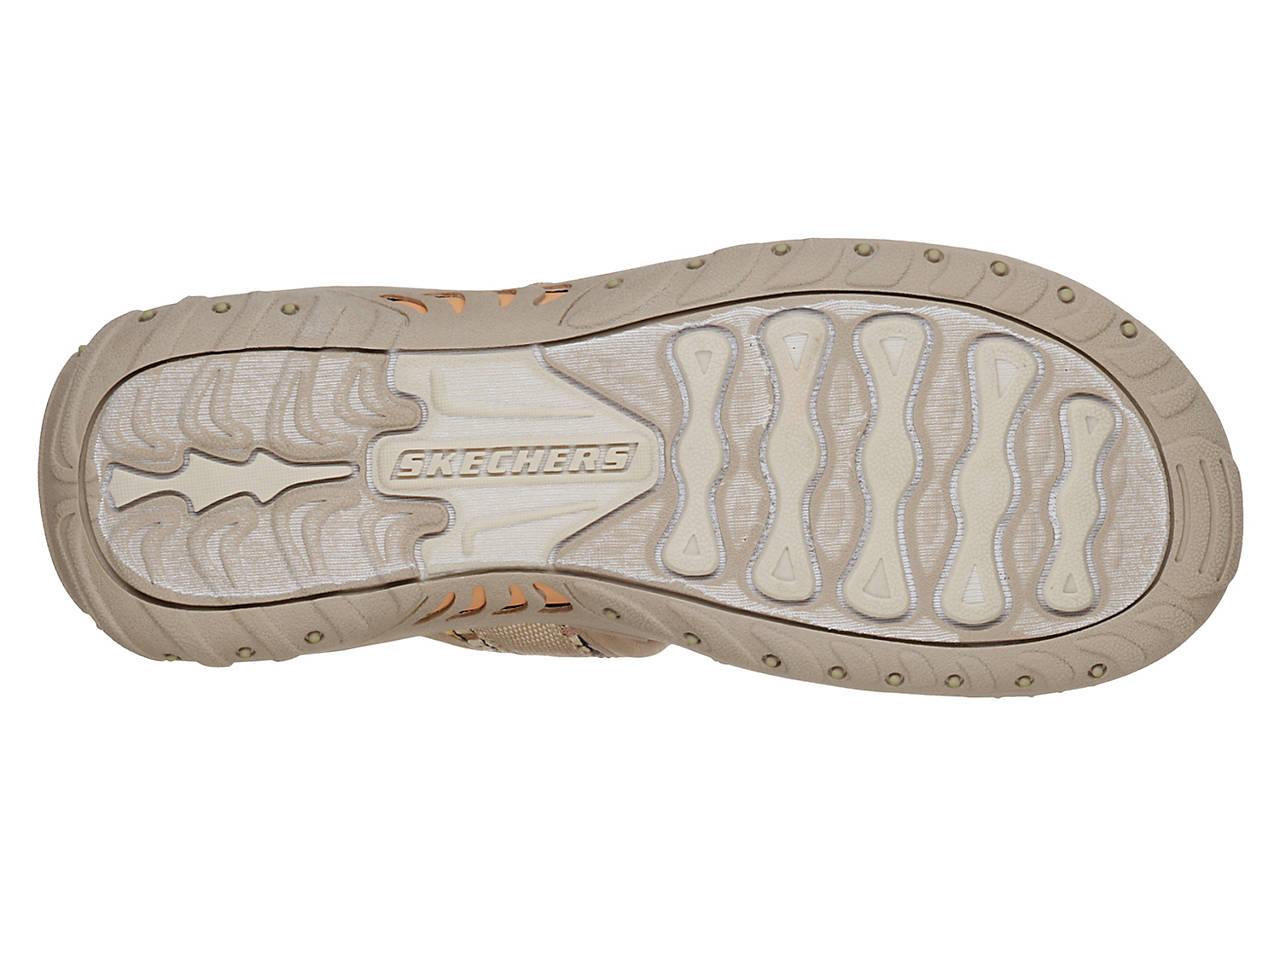 9bda081b409b Skechers Reggae Mad Swag Sandal Women s Shoes